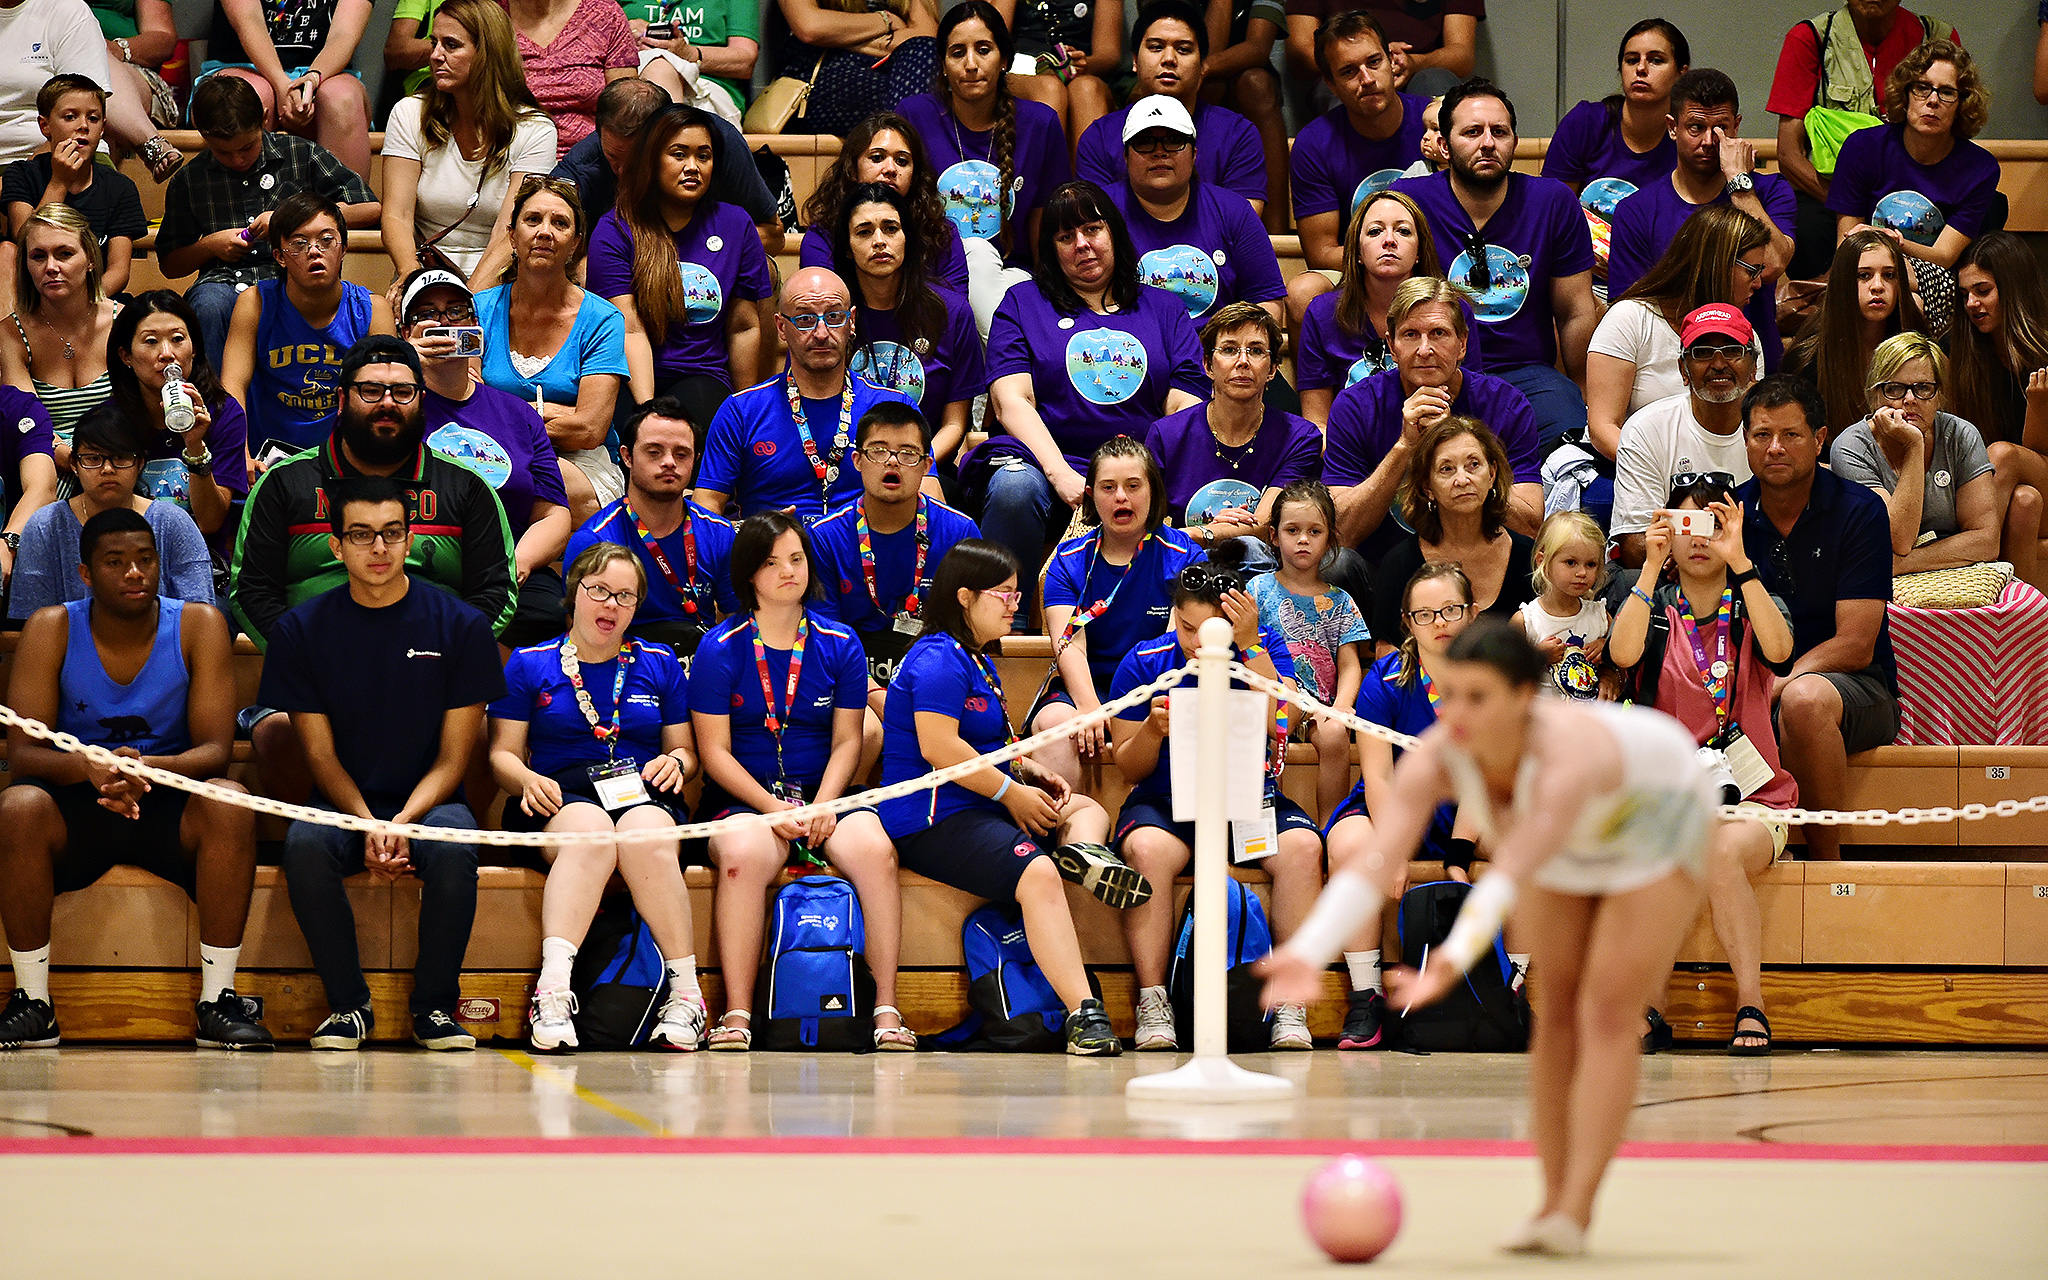 Gymnastics fans